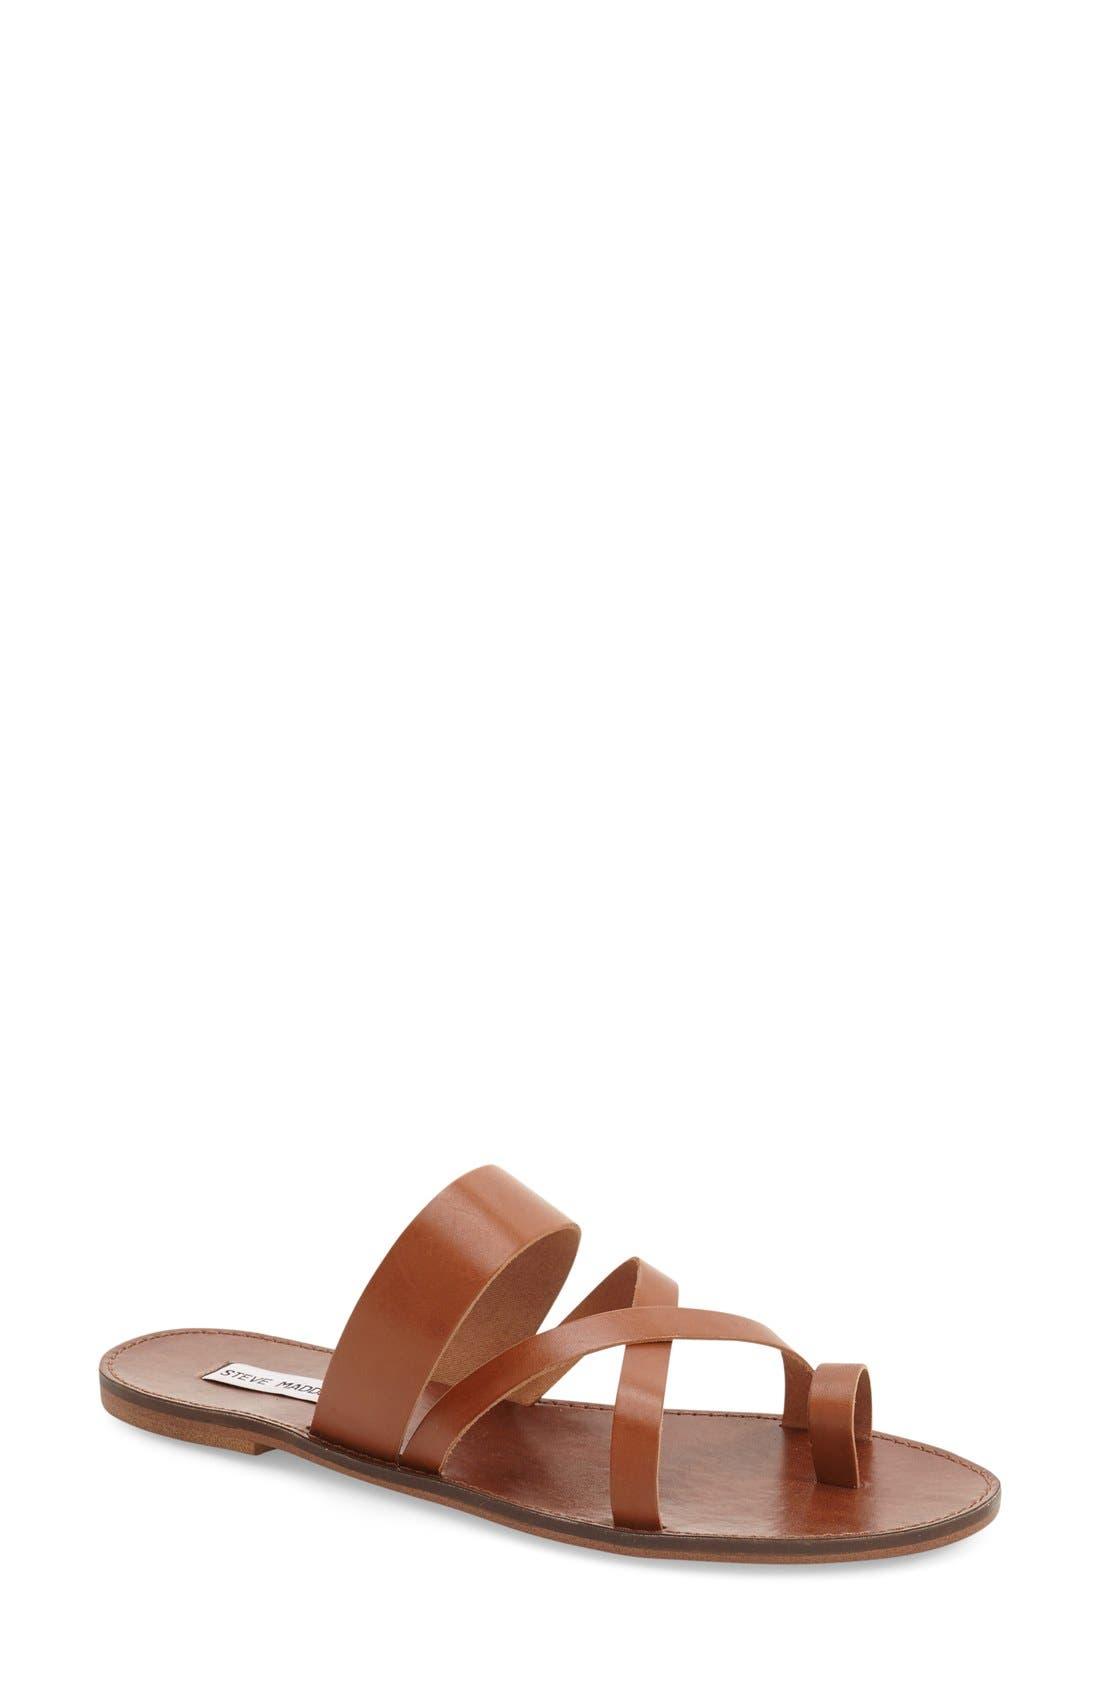 'Ambler' Sandal,                         Main,                         color, Tan Leather